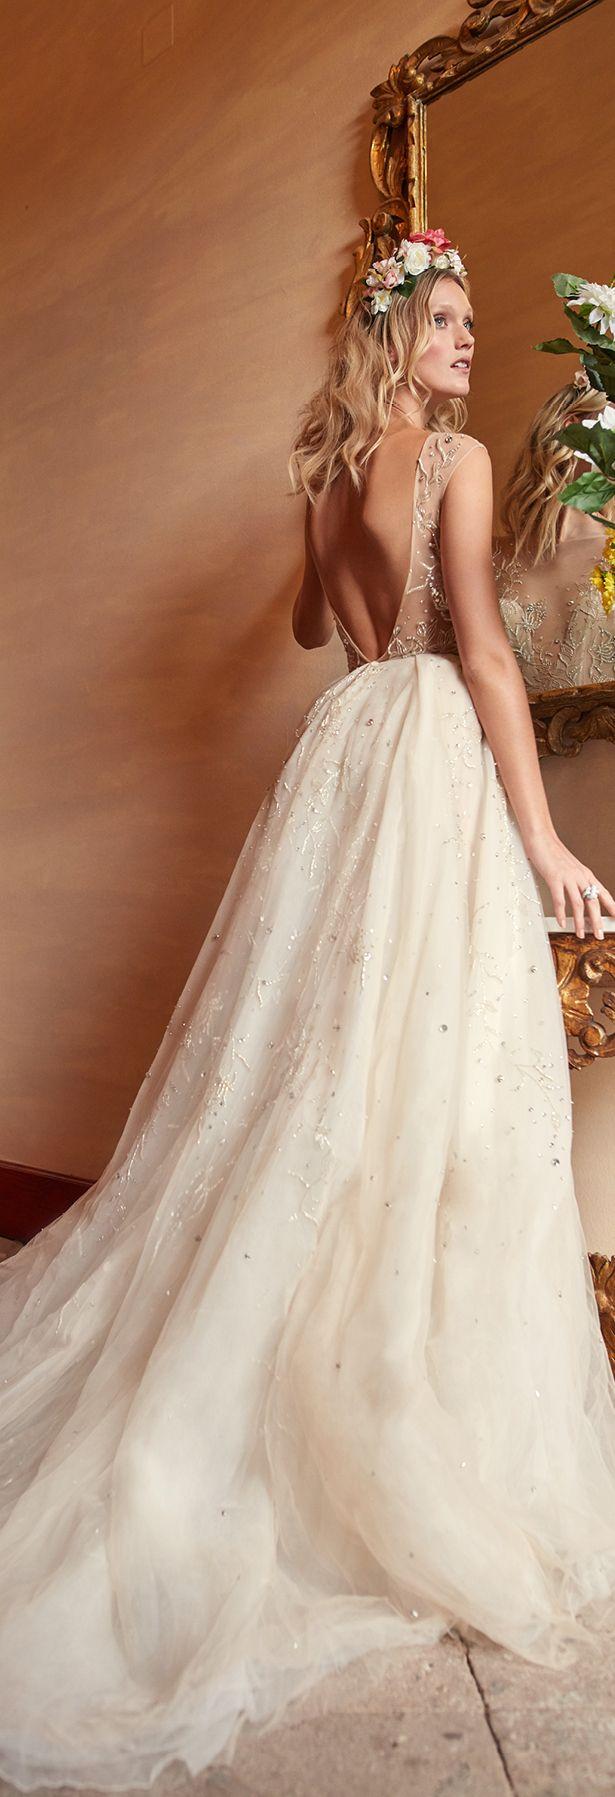 Galia Lahav Couture Bridal Rose Water Wedding Dress    #wedding #weddings #weddingday #weddingdress #weddingideas #weddingdresses #galialahav #couture #bride #bridal #weddingstyle #weddingfashion #bridalfashion